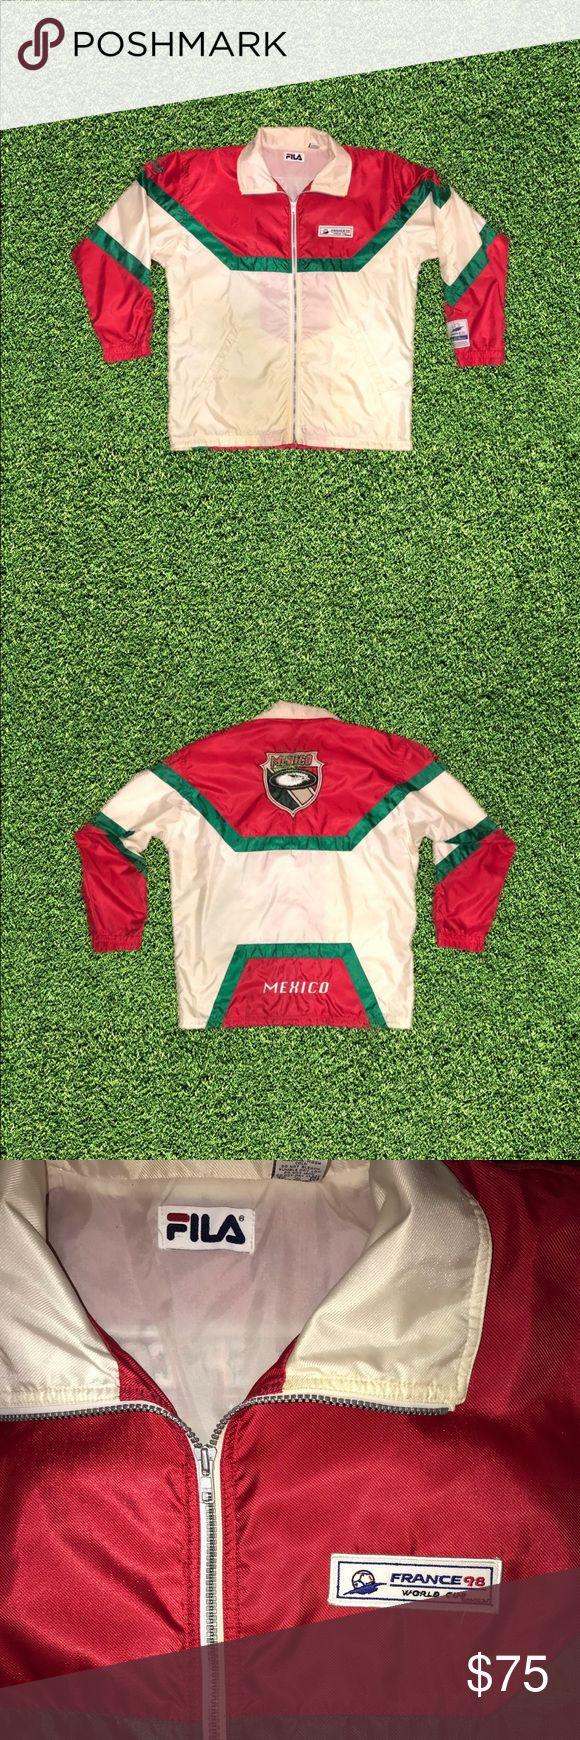 Vintage Fila 1998 World Cup Mexico Windbreaker In 2020 Fila Jacket Windbreaker Windbreaker Jacket